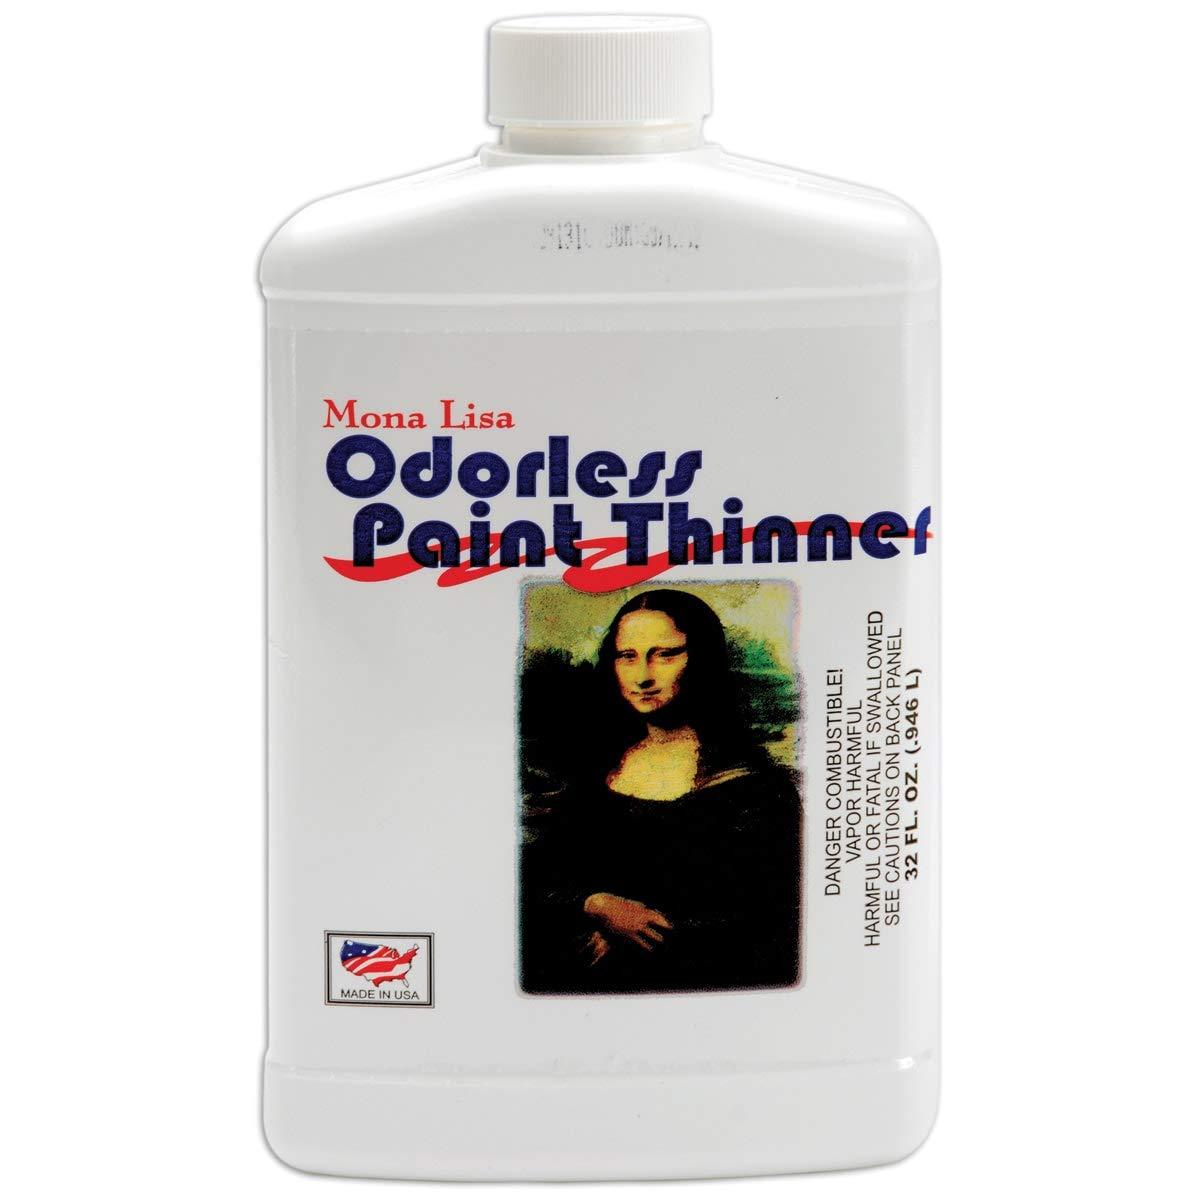 Mona Lisa 32-Ounce Odorless Paint Thinner by Mona Lisa